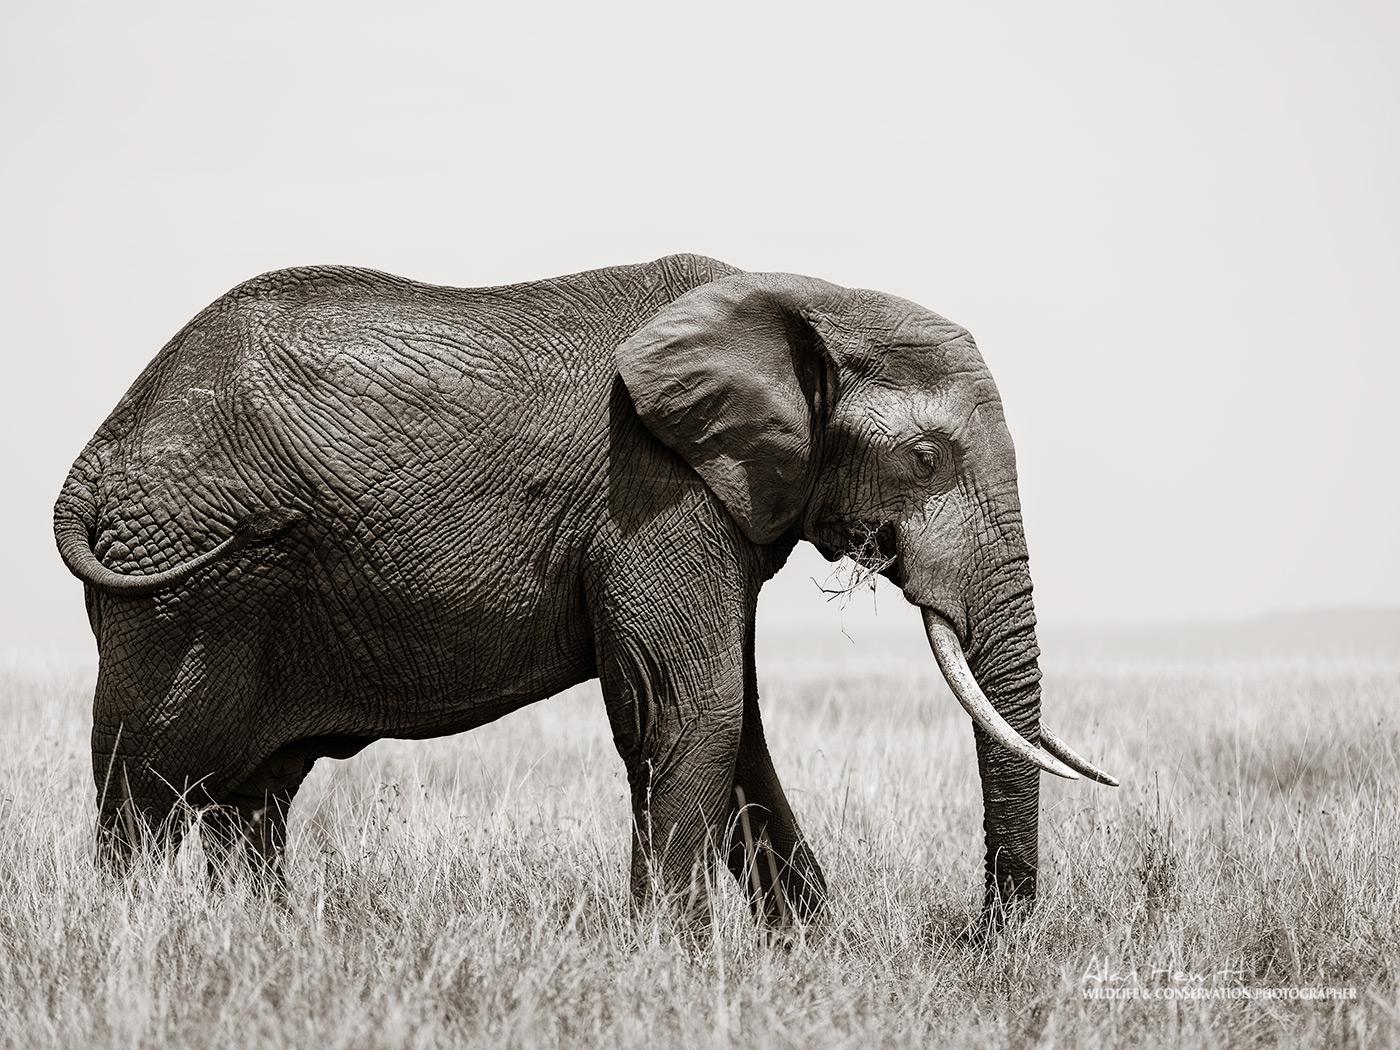 Bull Elephant – Fujifilm Medium Format GFX50s & GF250mm Alan Hewitt Photography